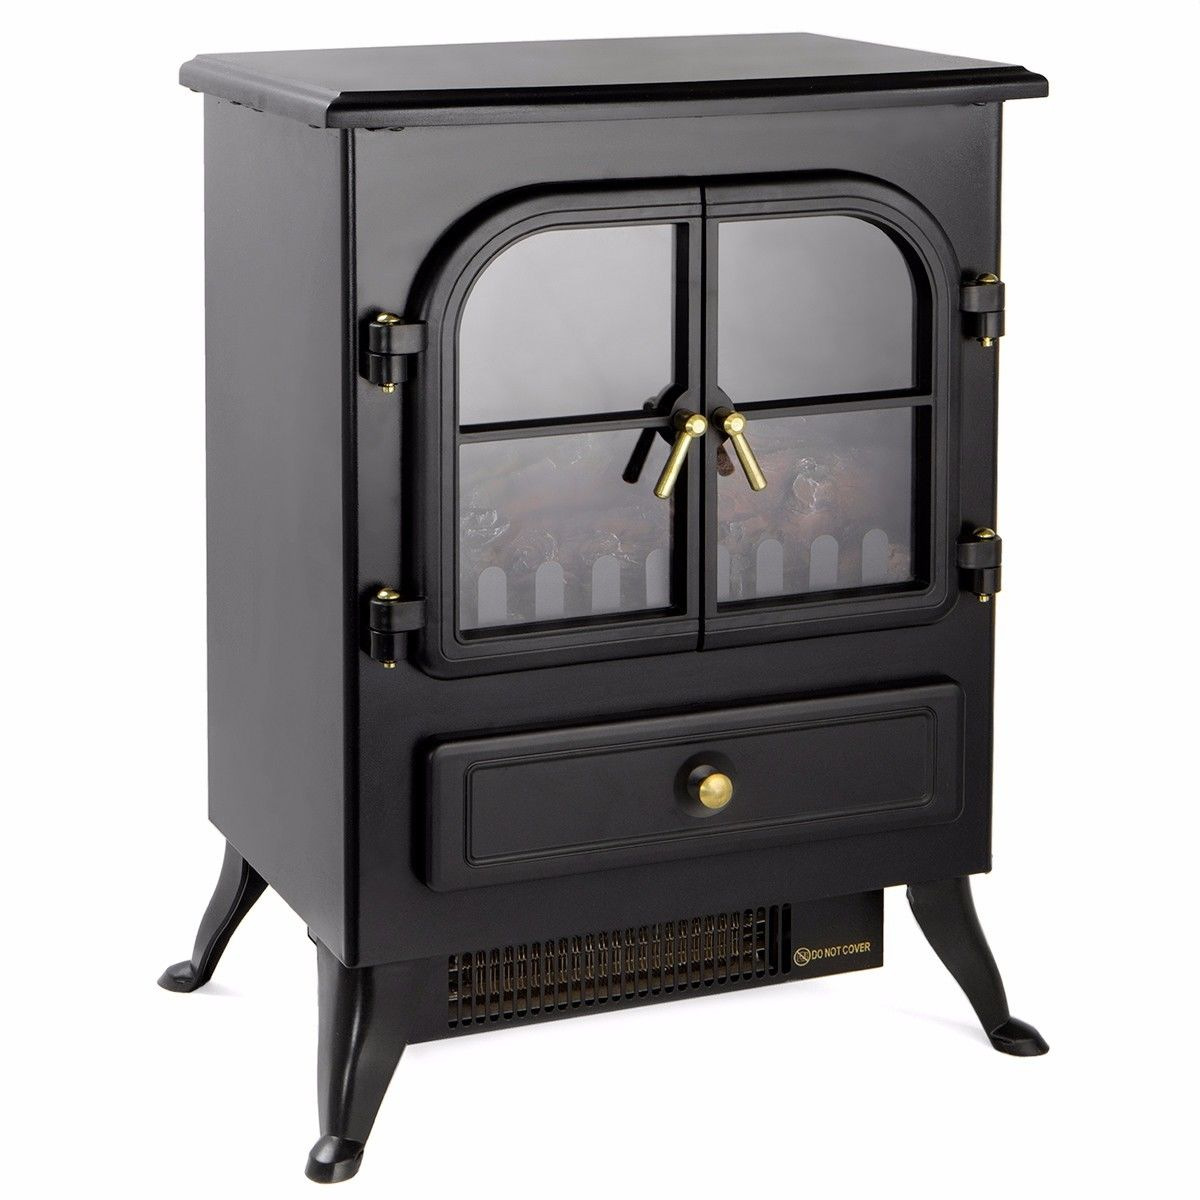 GHP 2-Heat Setting 2559BTU/5118BTU Fireplace Heater with Glass Viewing Window